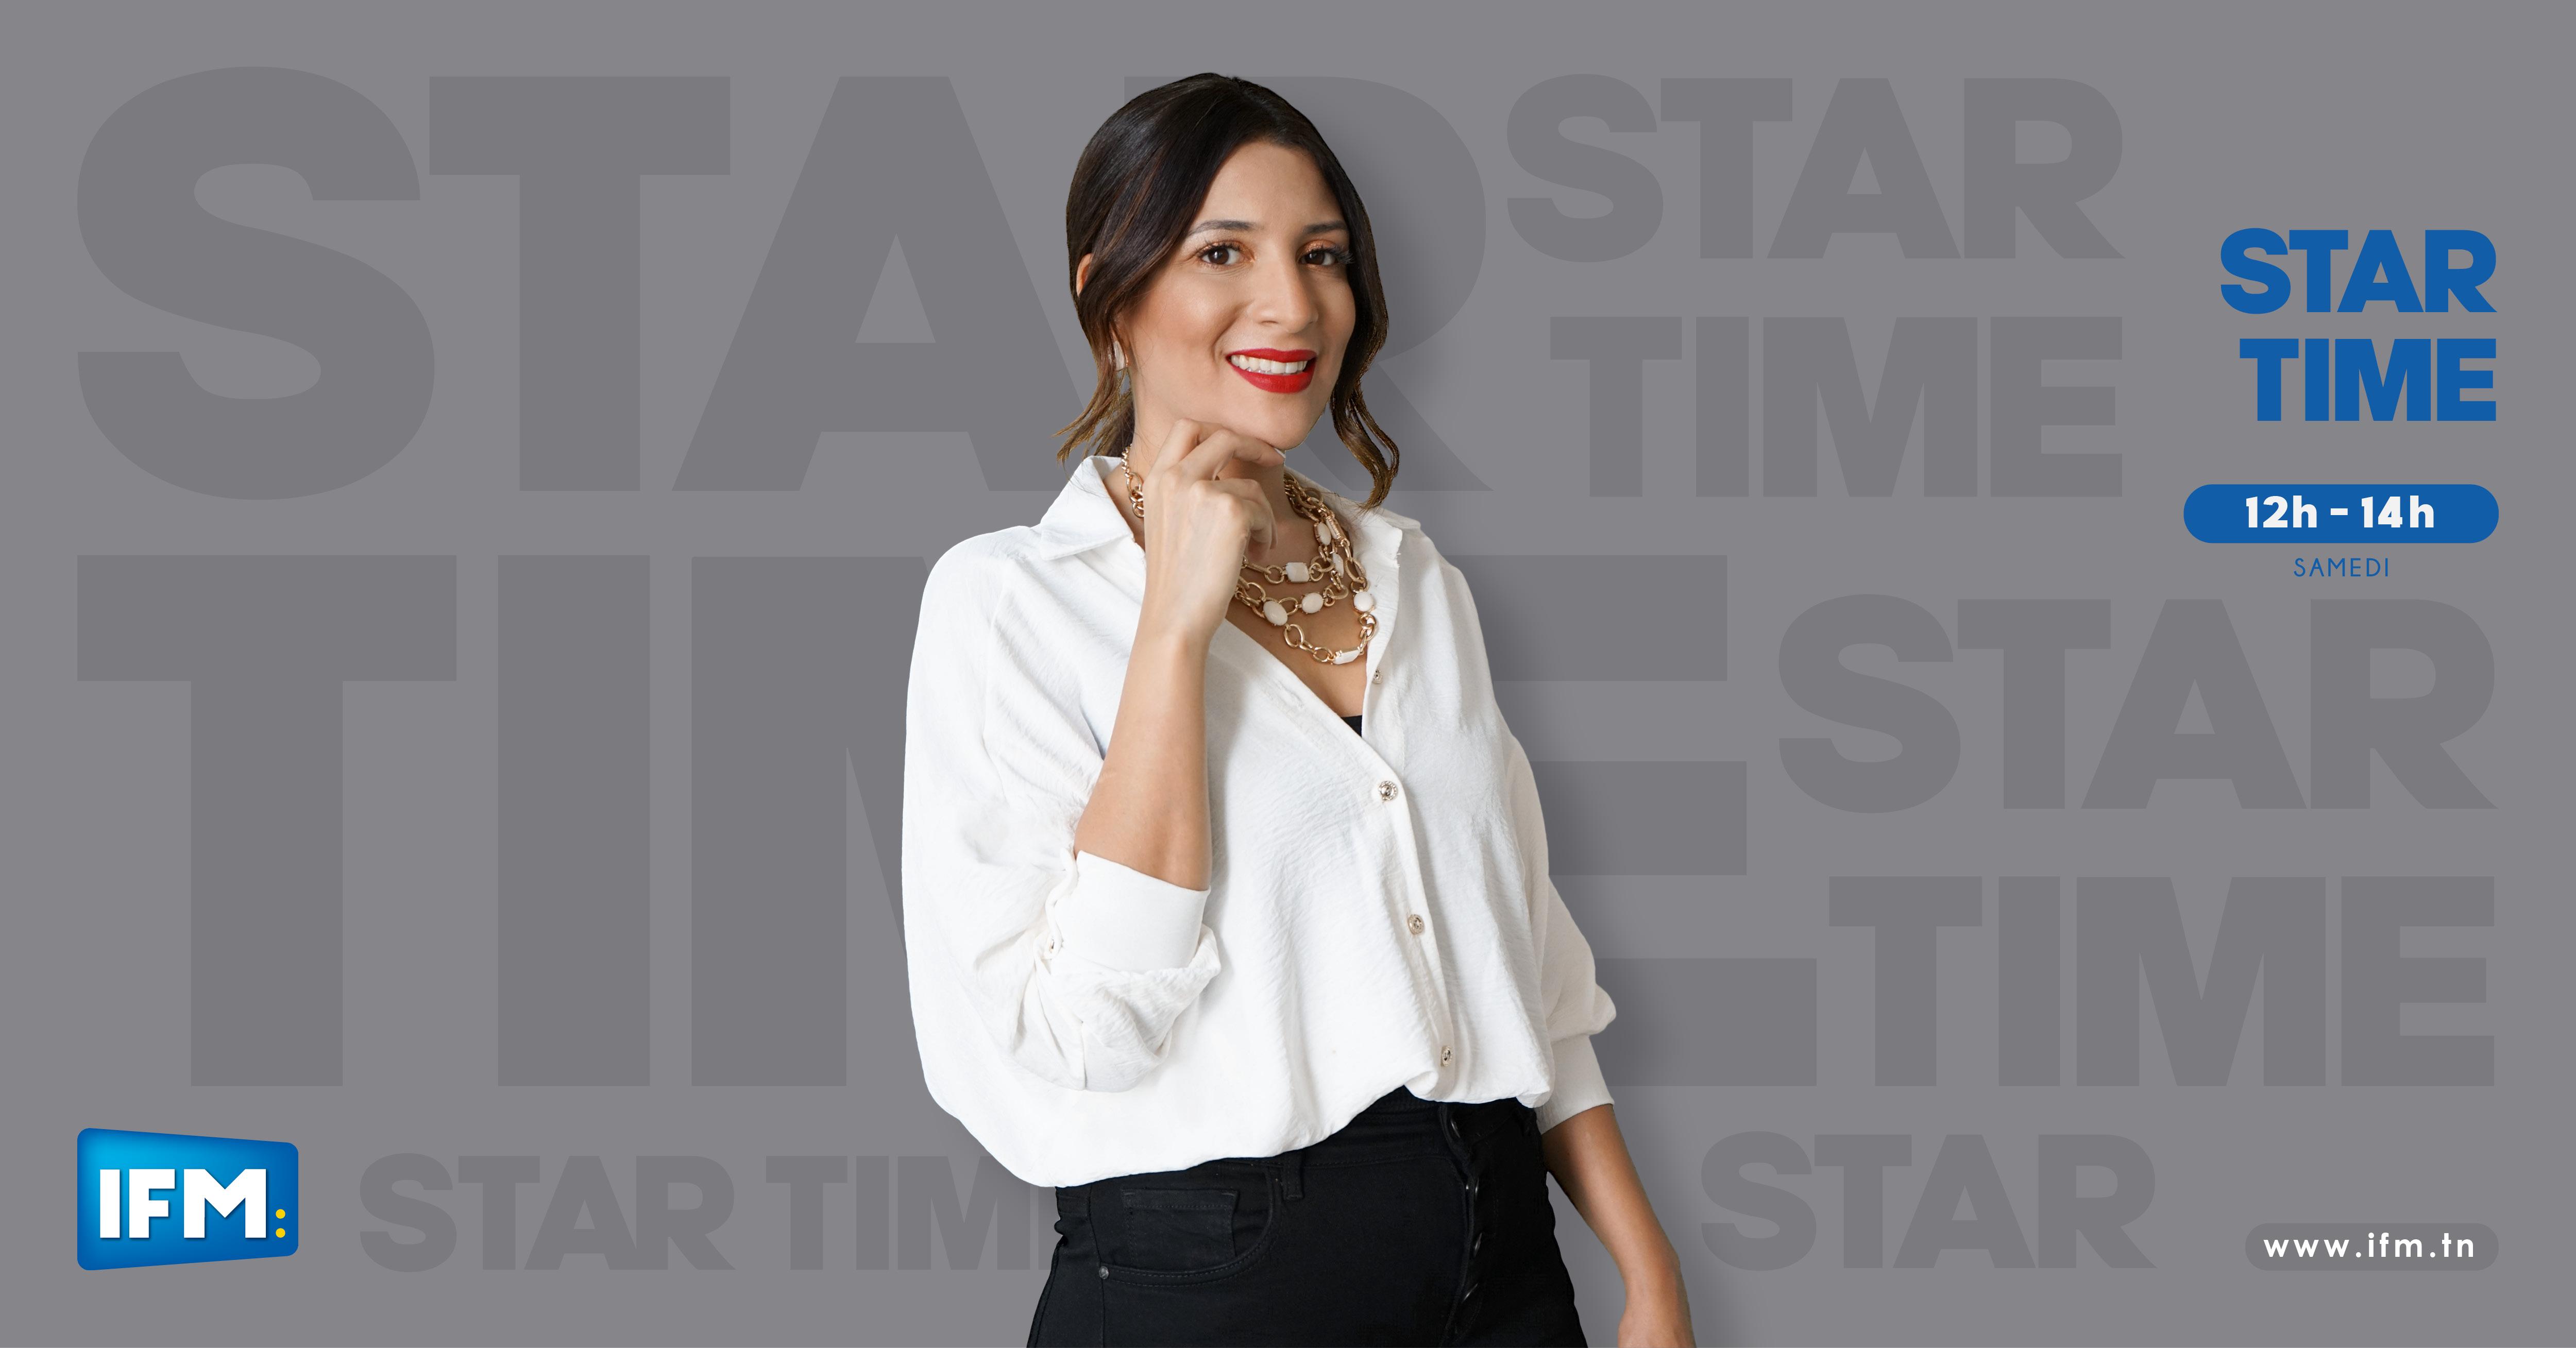 Star Time du 06 02 2021 Star time